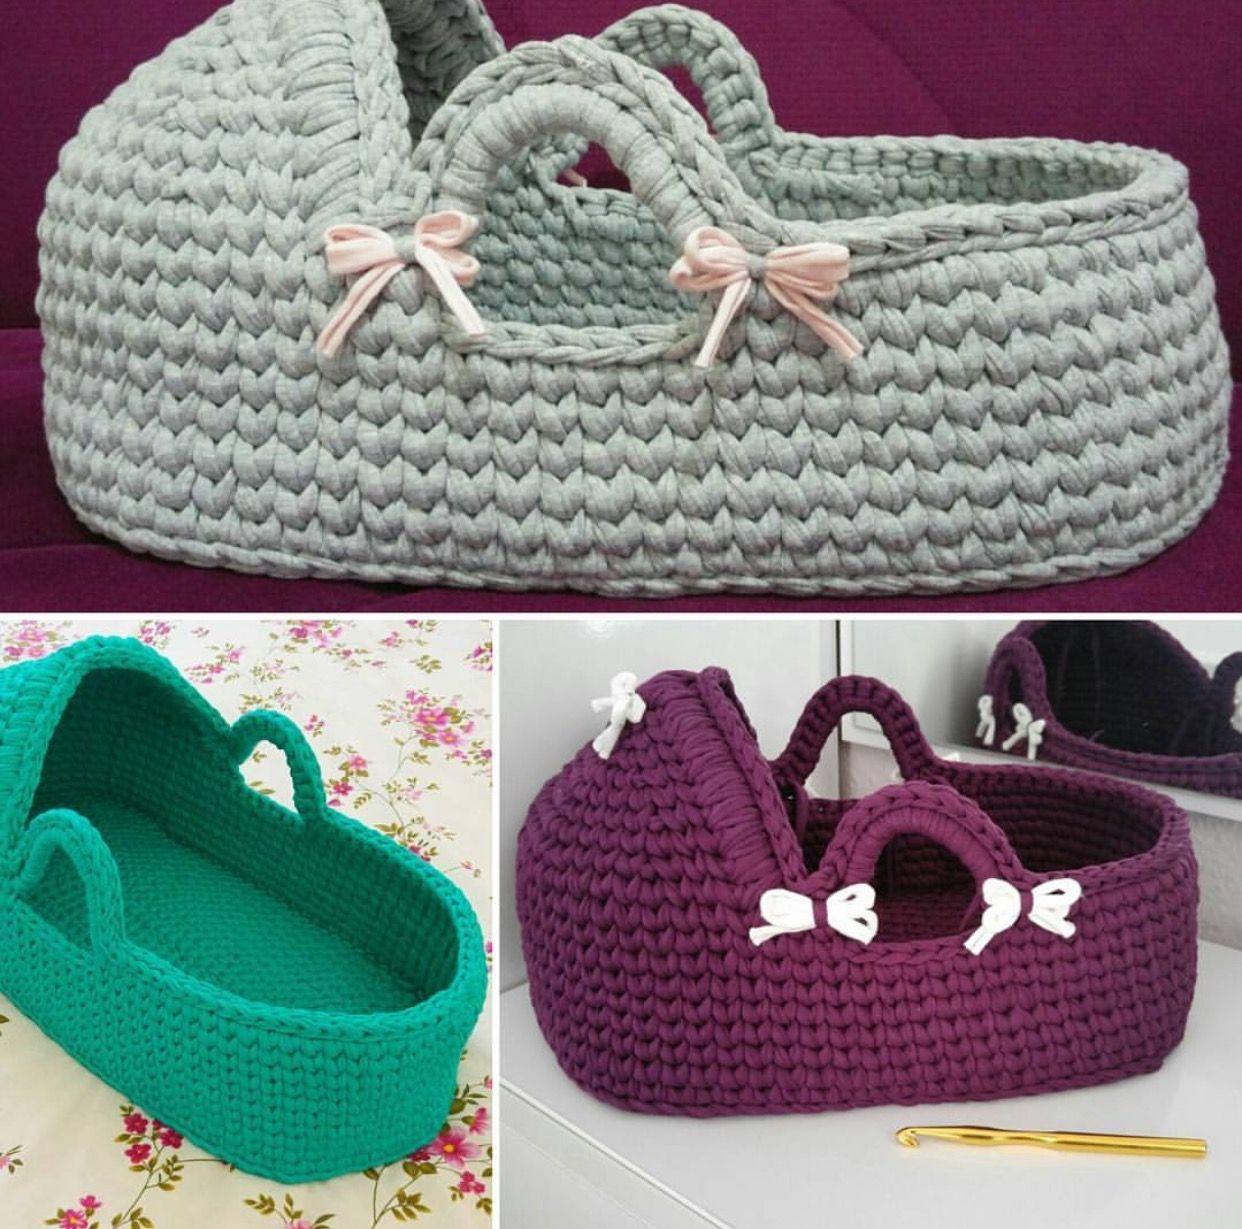 Crocheted Babies Carry Cot Crochet For Kids Crochet Dolls